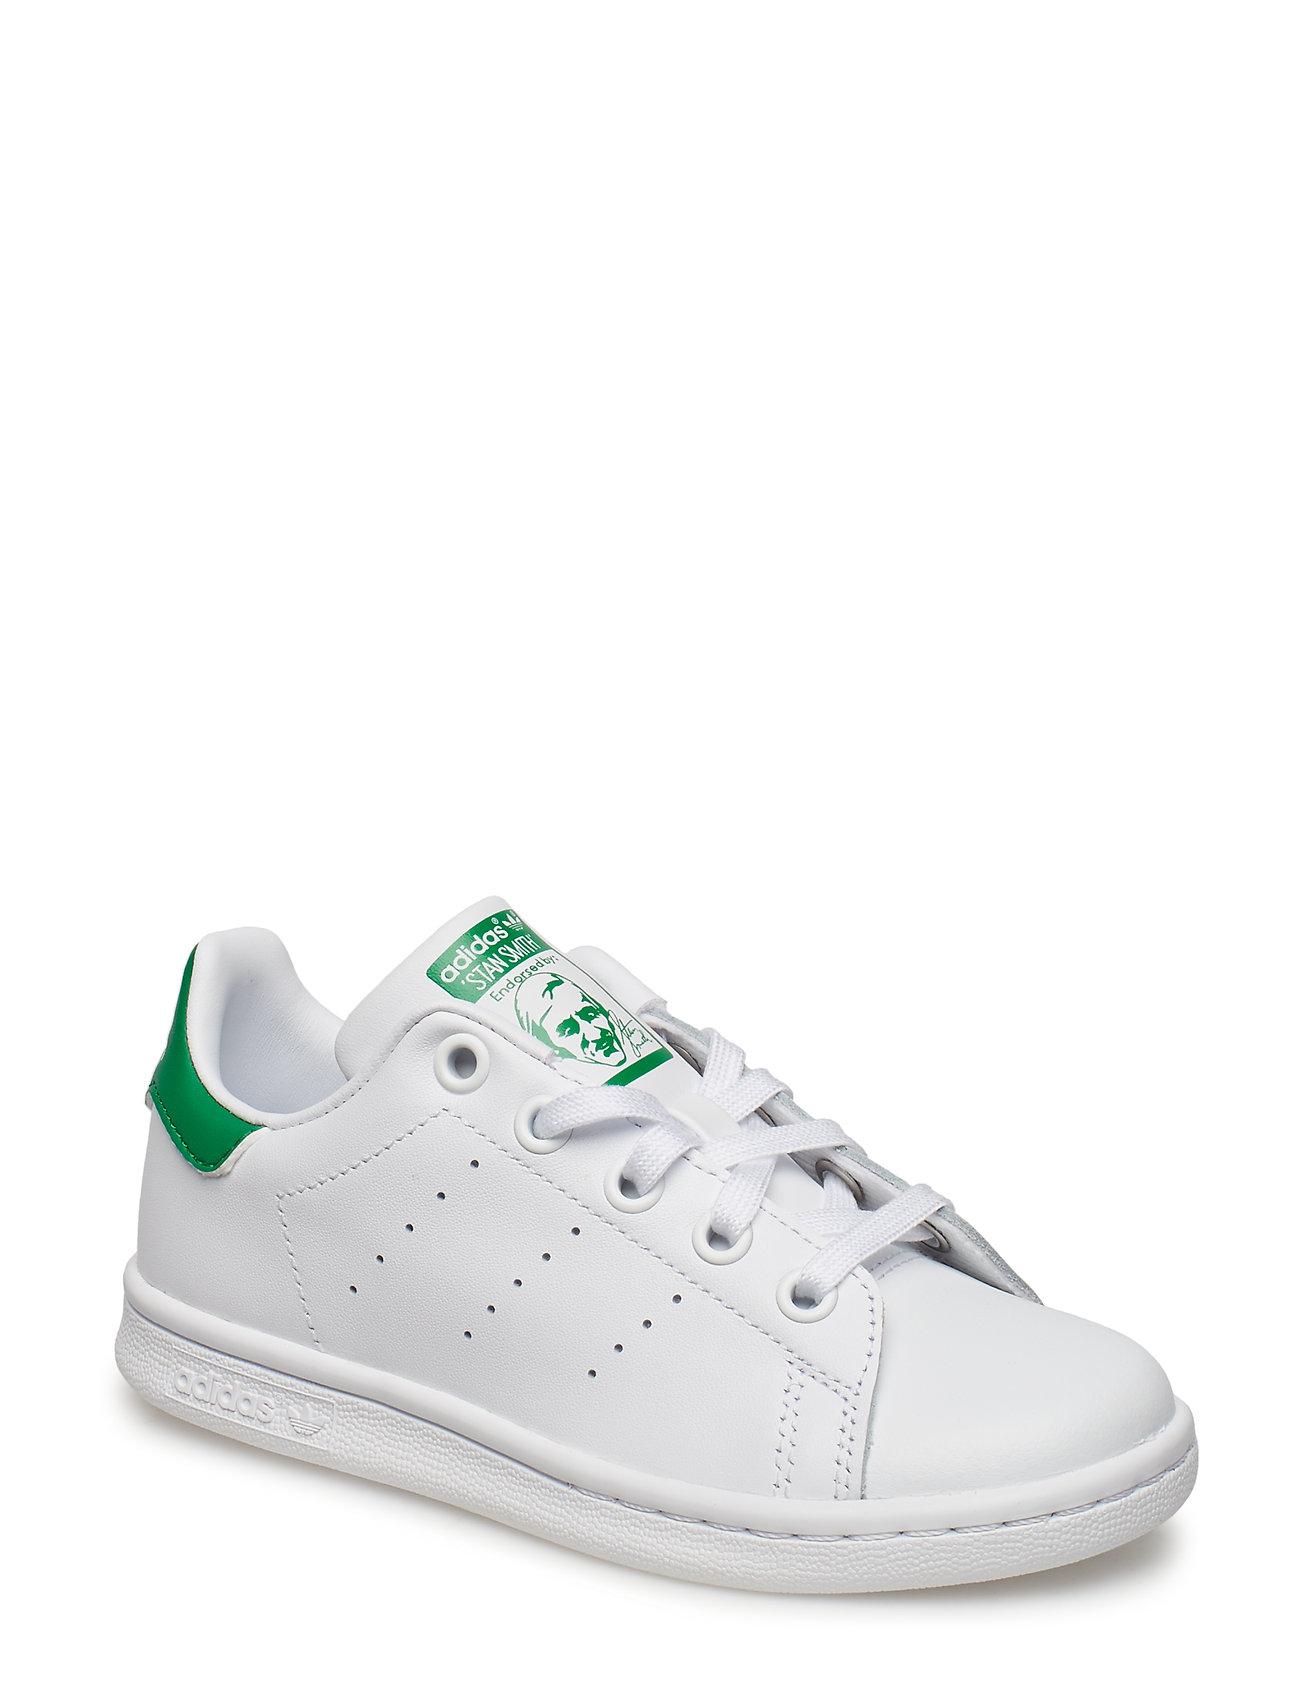 adidas Originals STAN SMITH C - FTWWHT/FTWWHT/GREEN